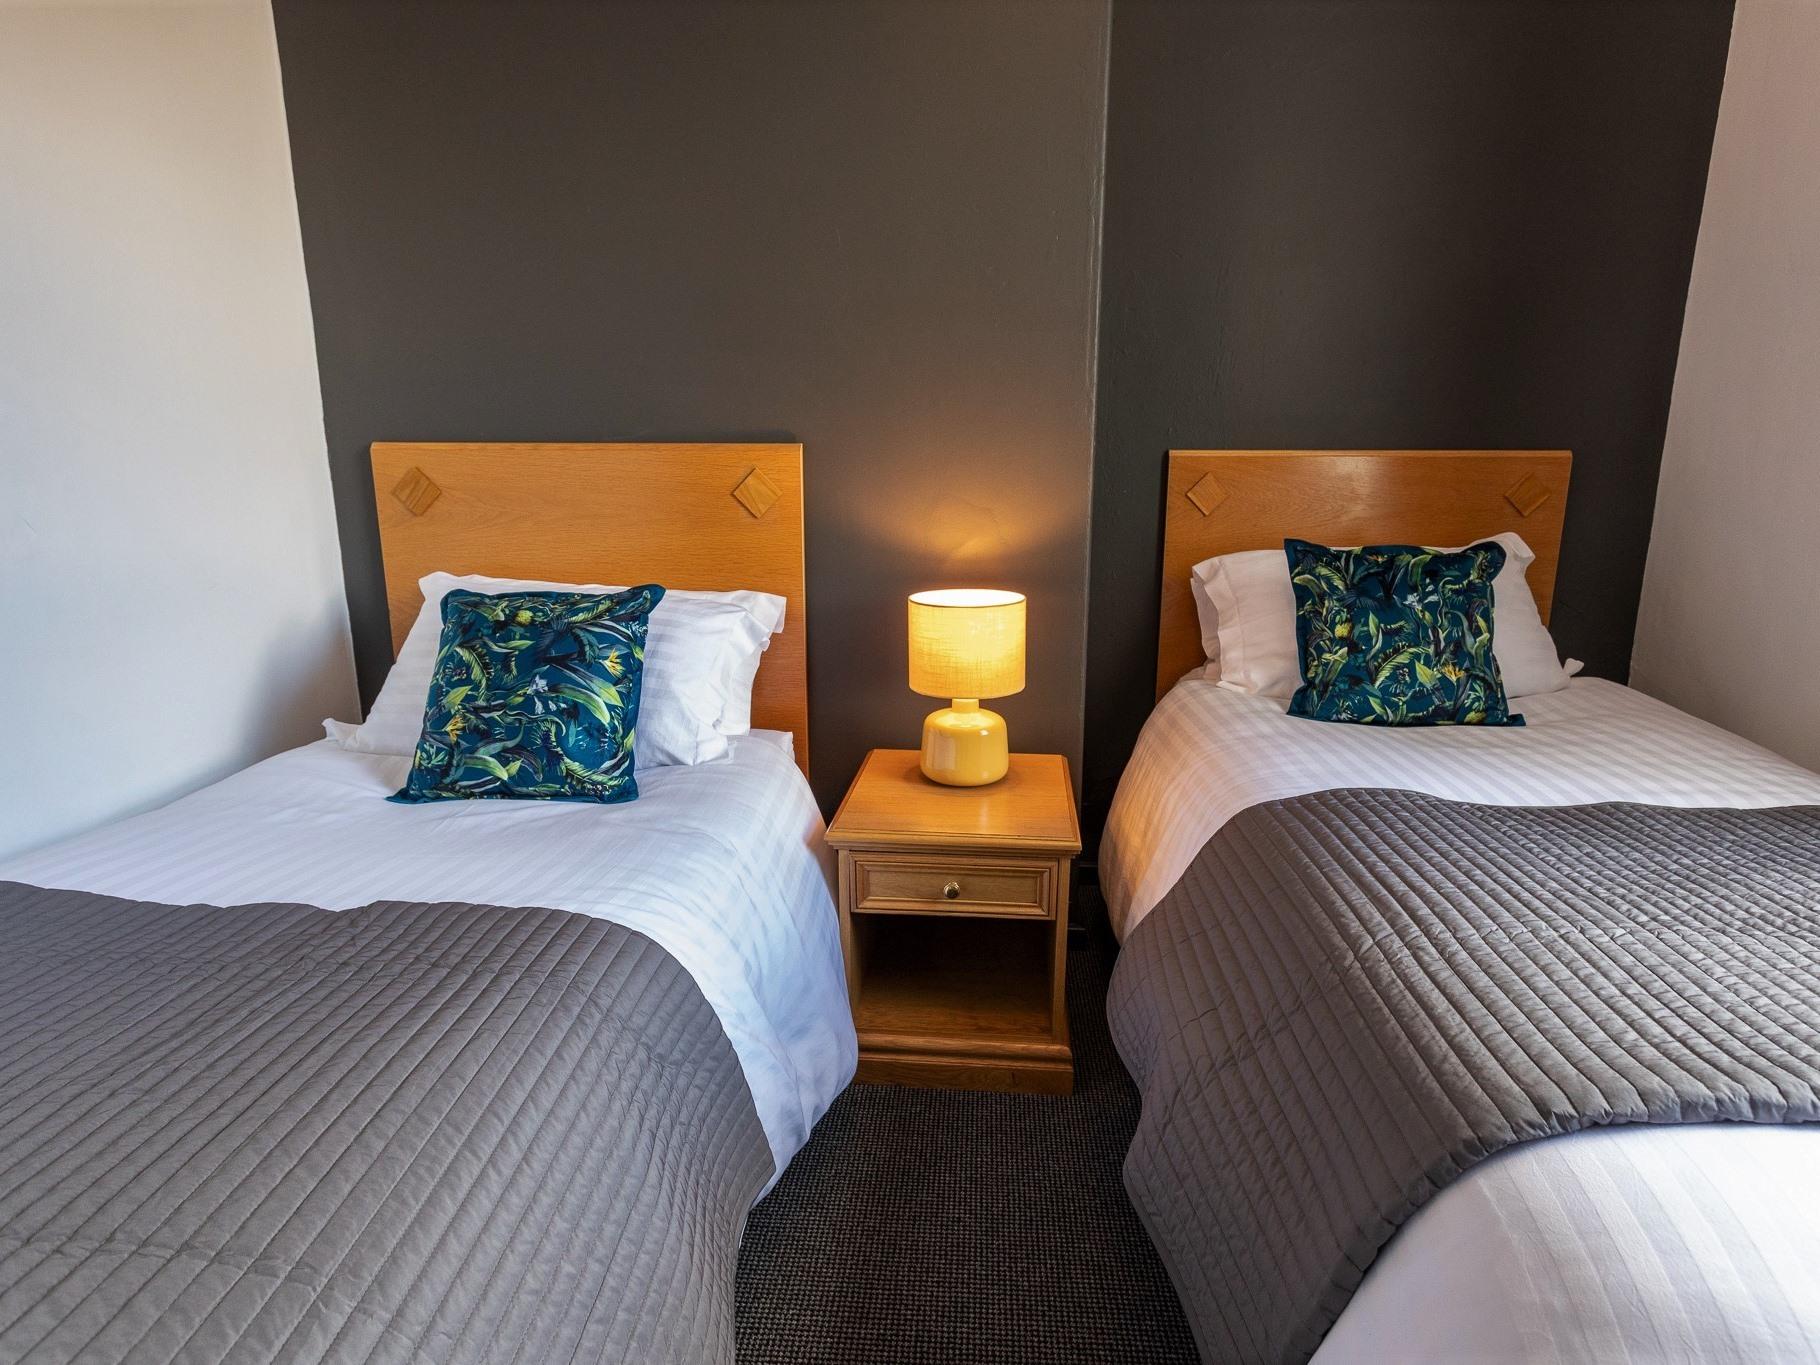 Twin Room - Shared Facilities